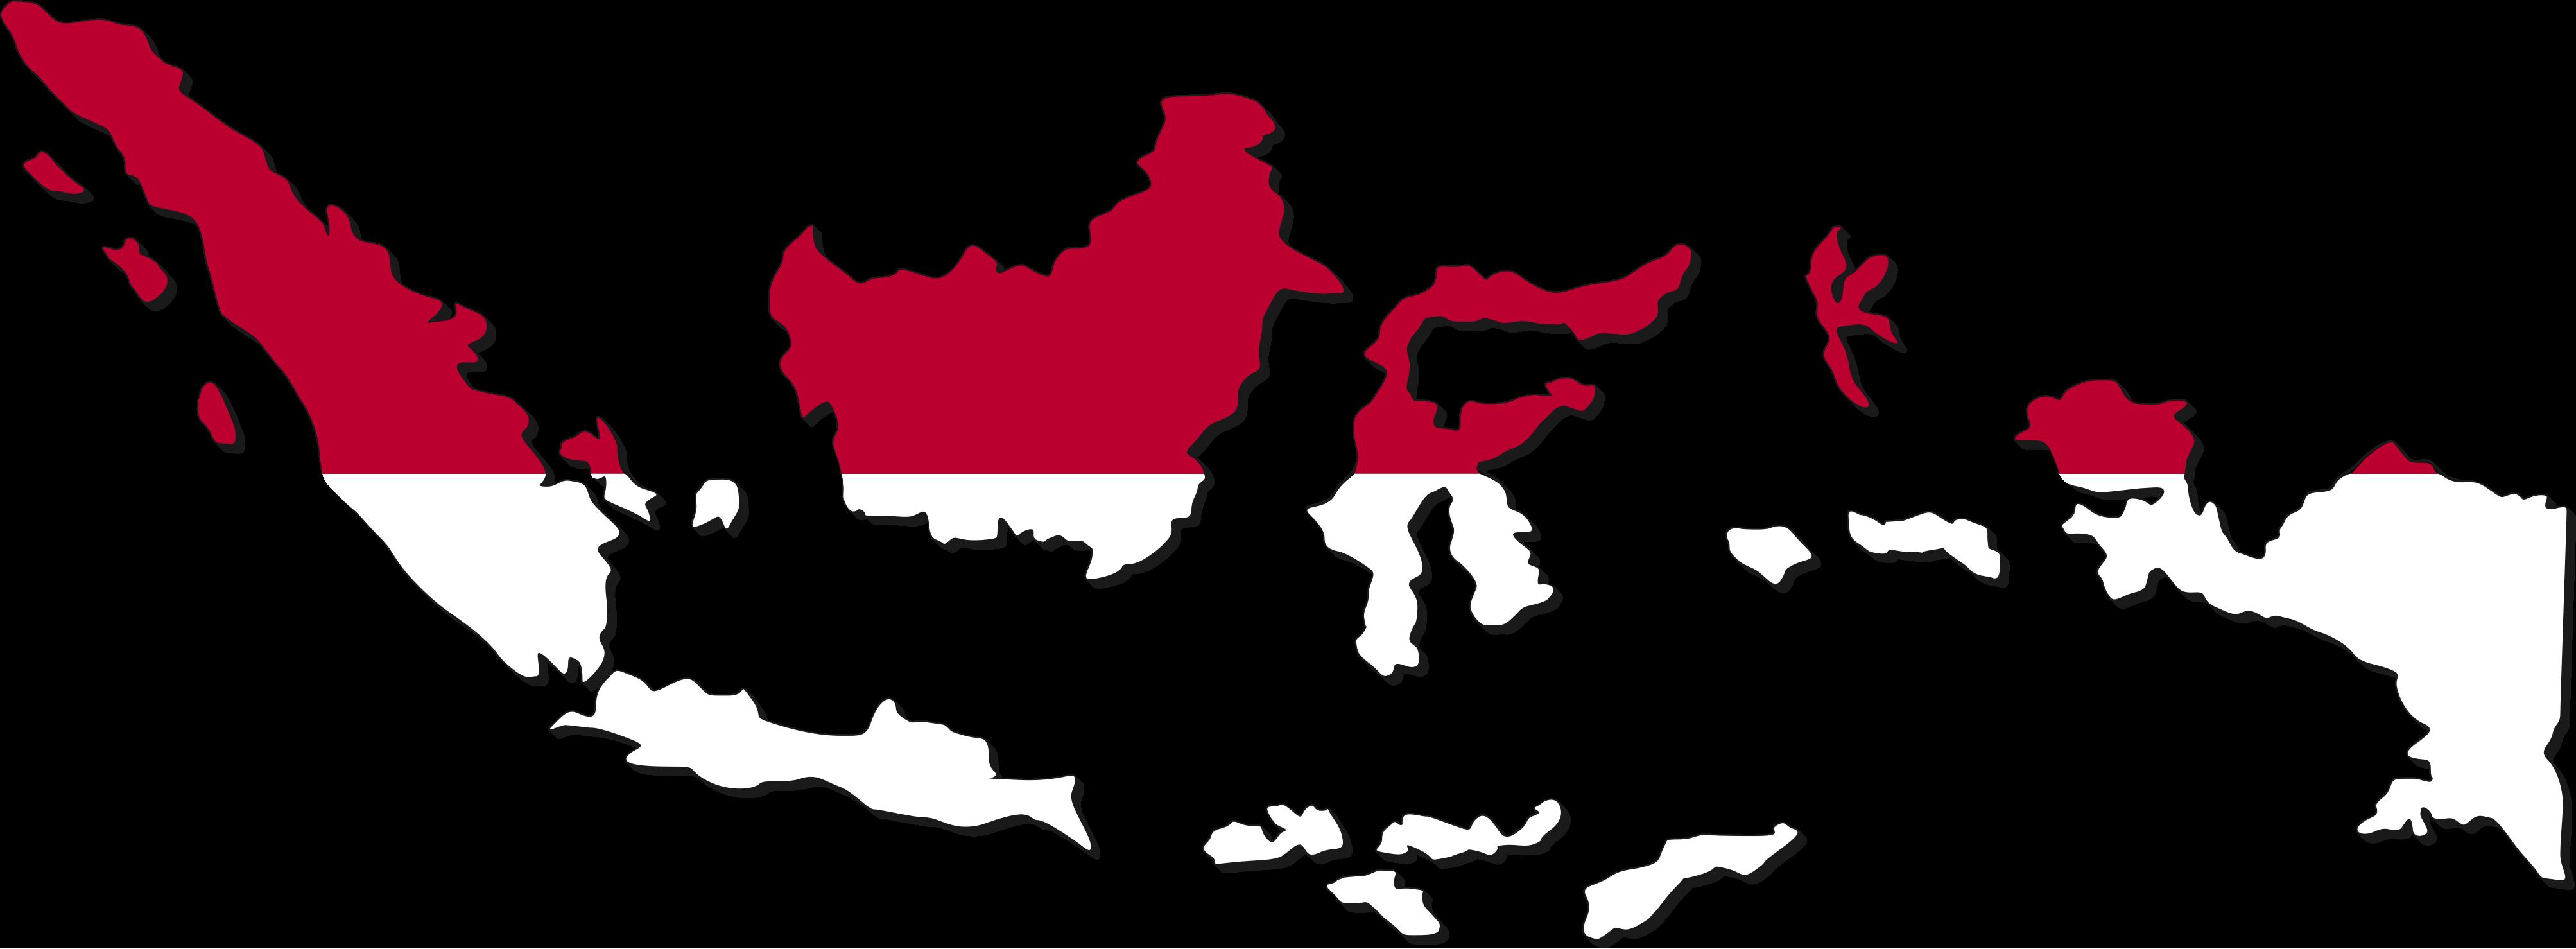 Pulau Terbesar Di Indonesia Jrangoan Magazine